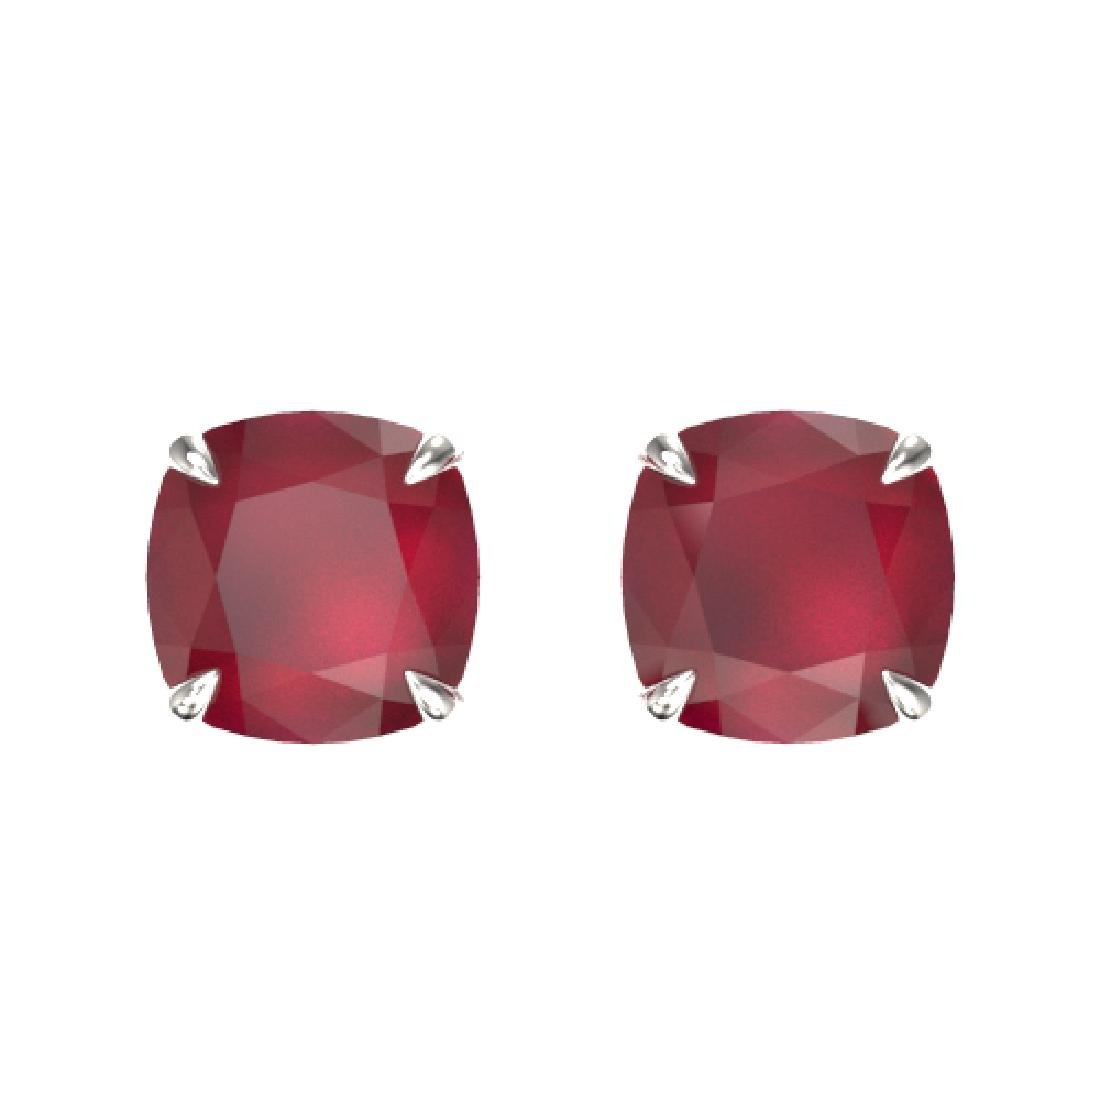 4 CTW Cushion Cut Ruby Designer Solitaire Stud Earrings